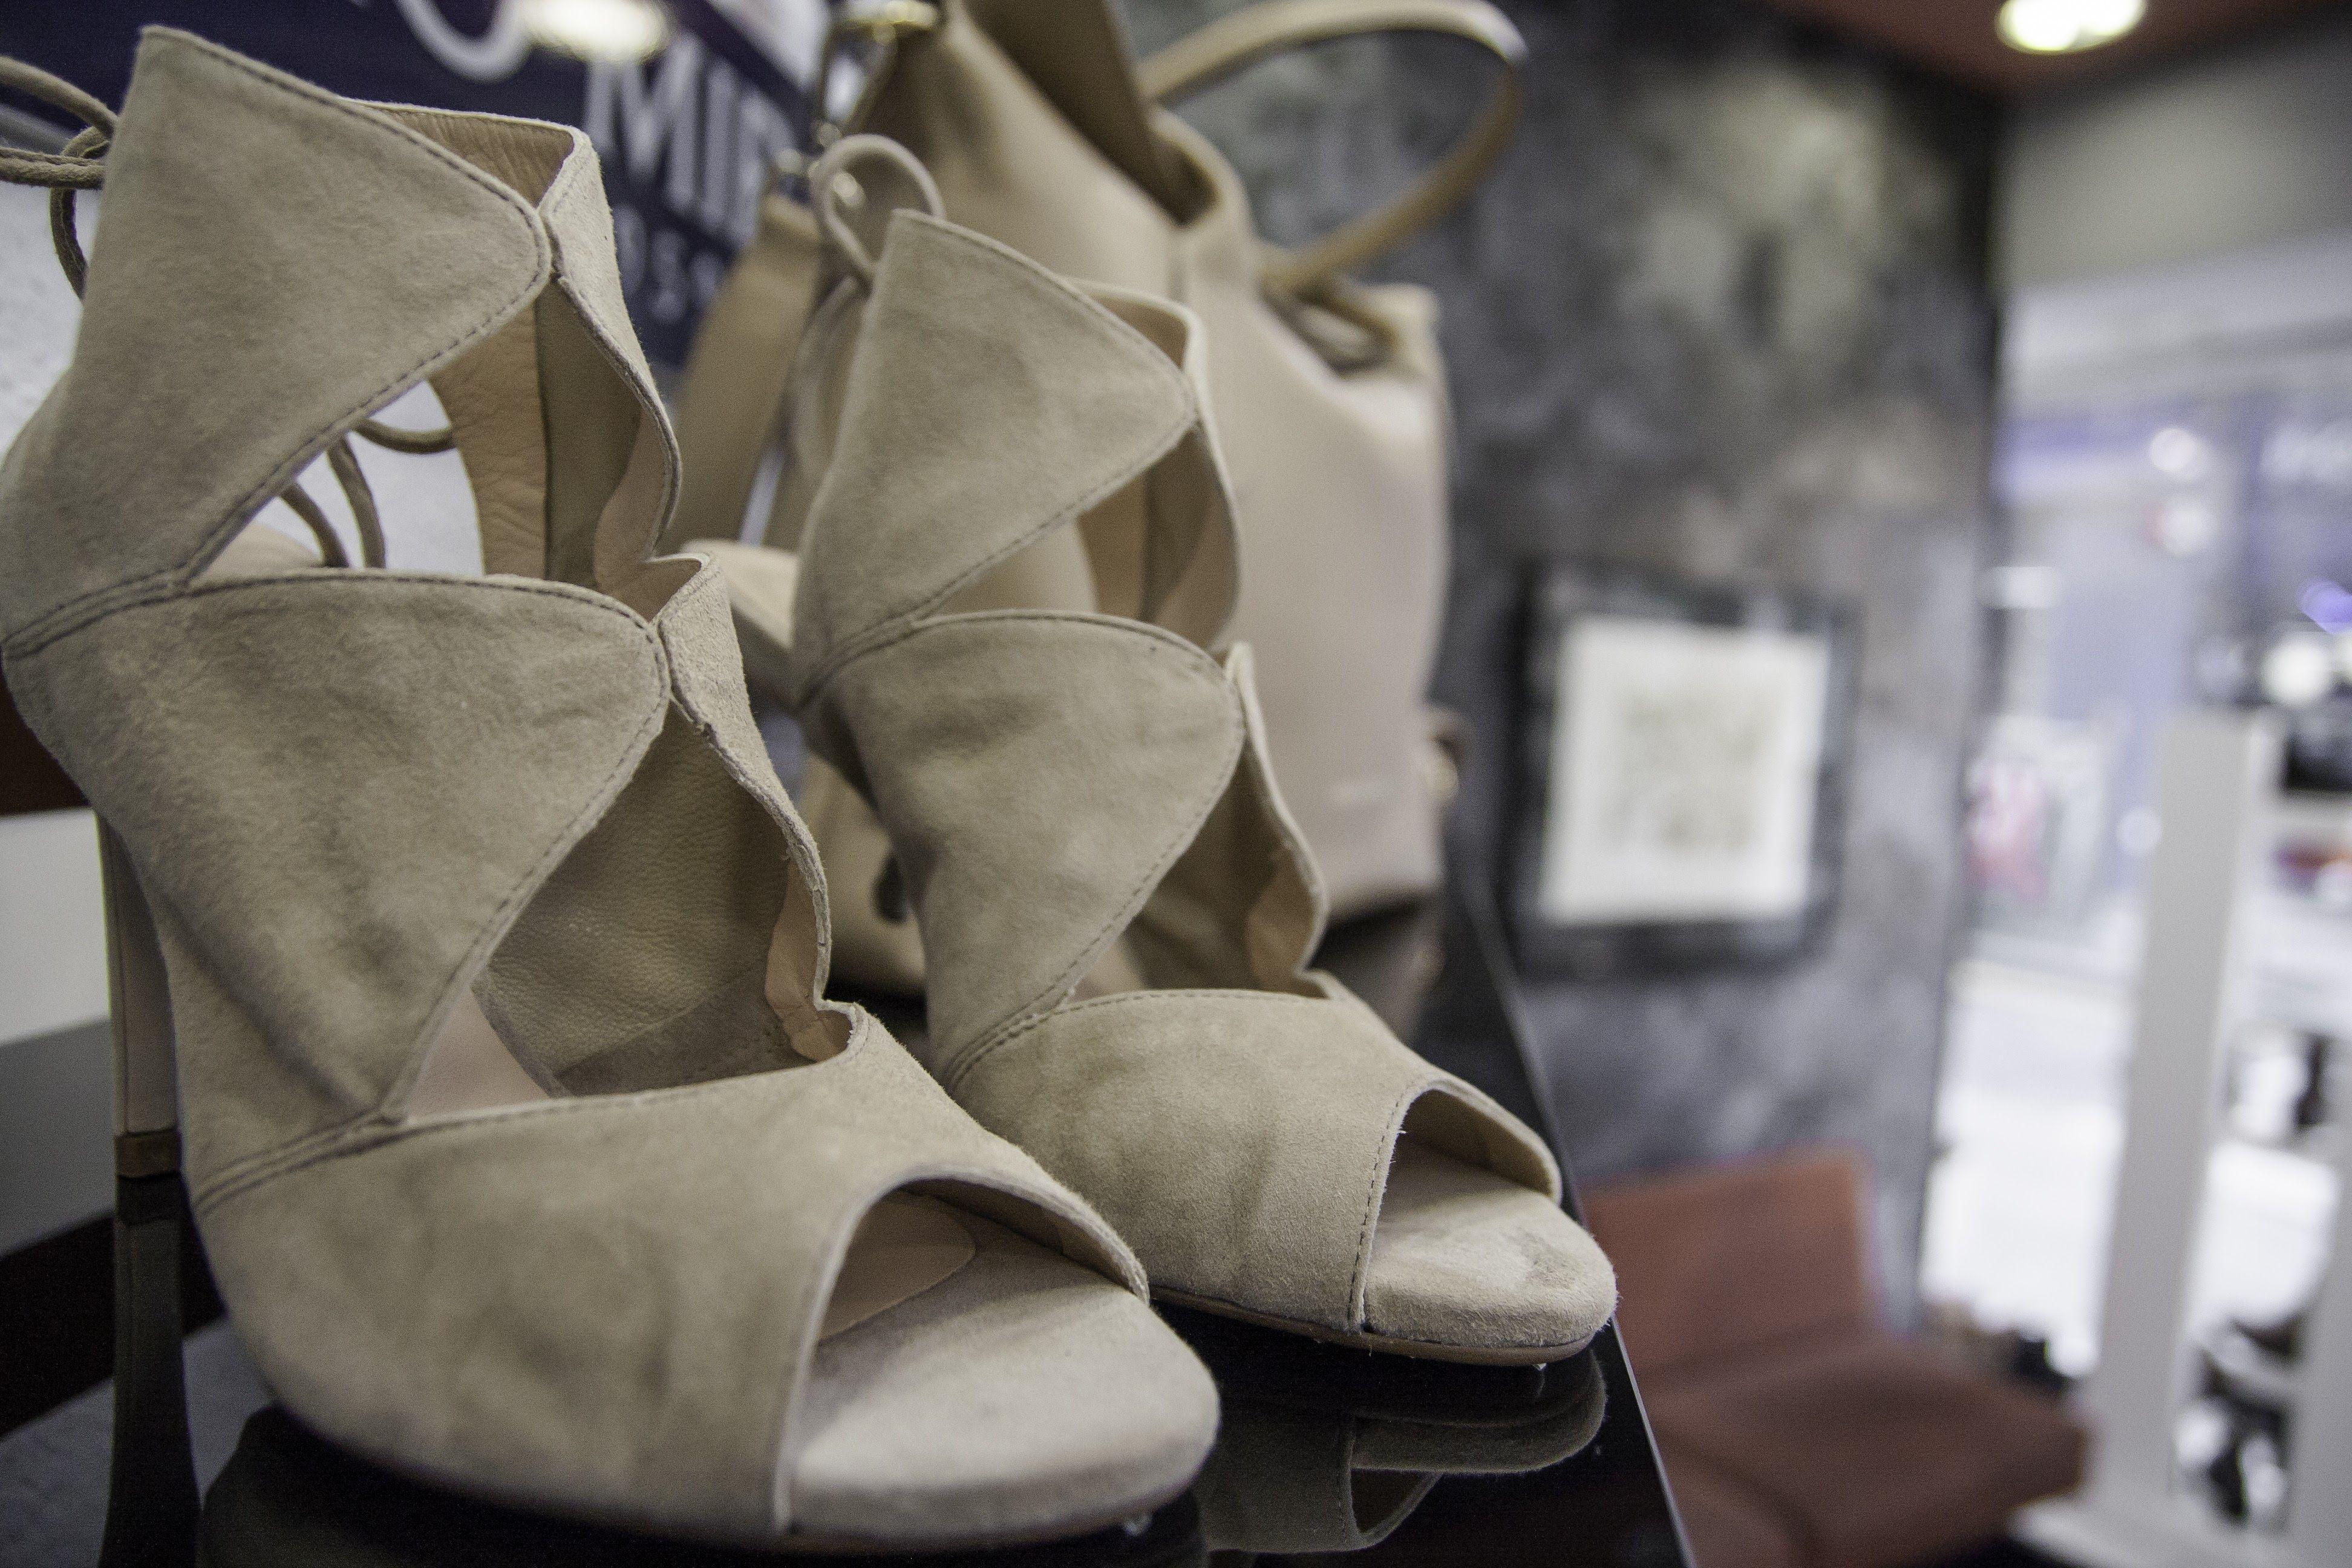 Foto 7 de Calzado para mujer en  | Calzados Prietos